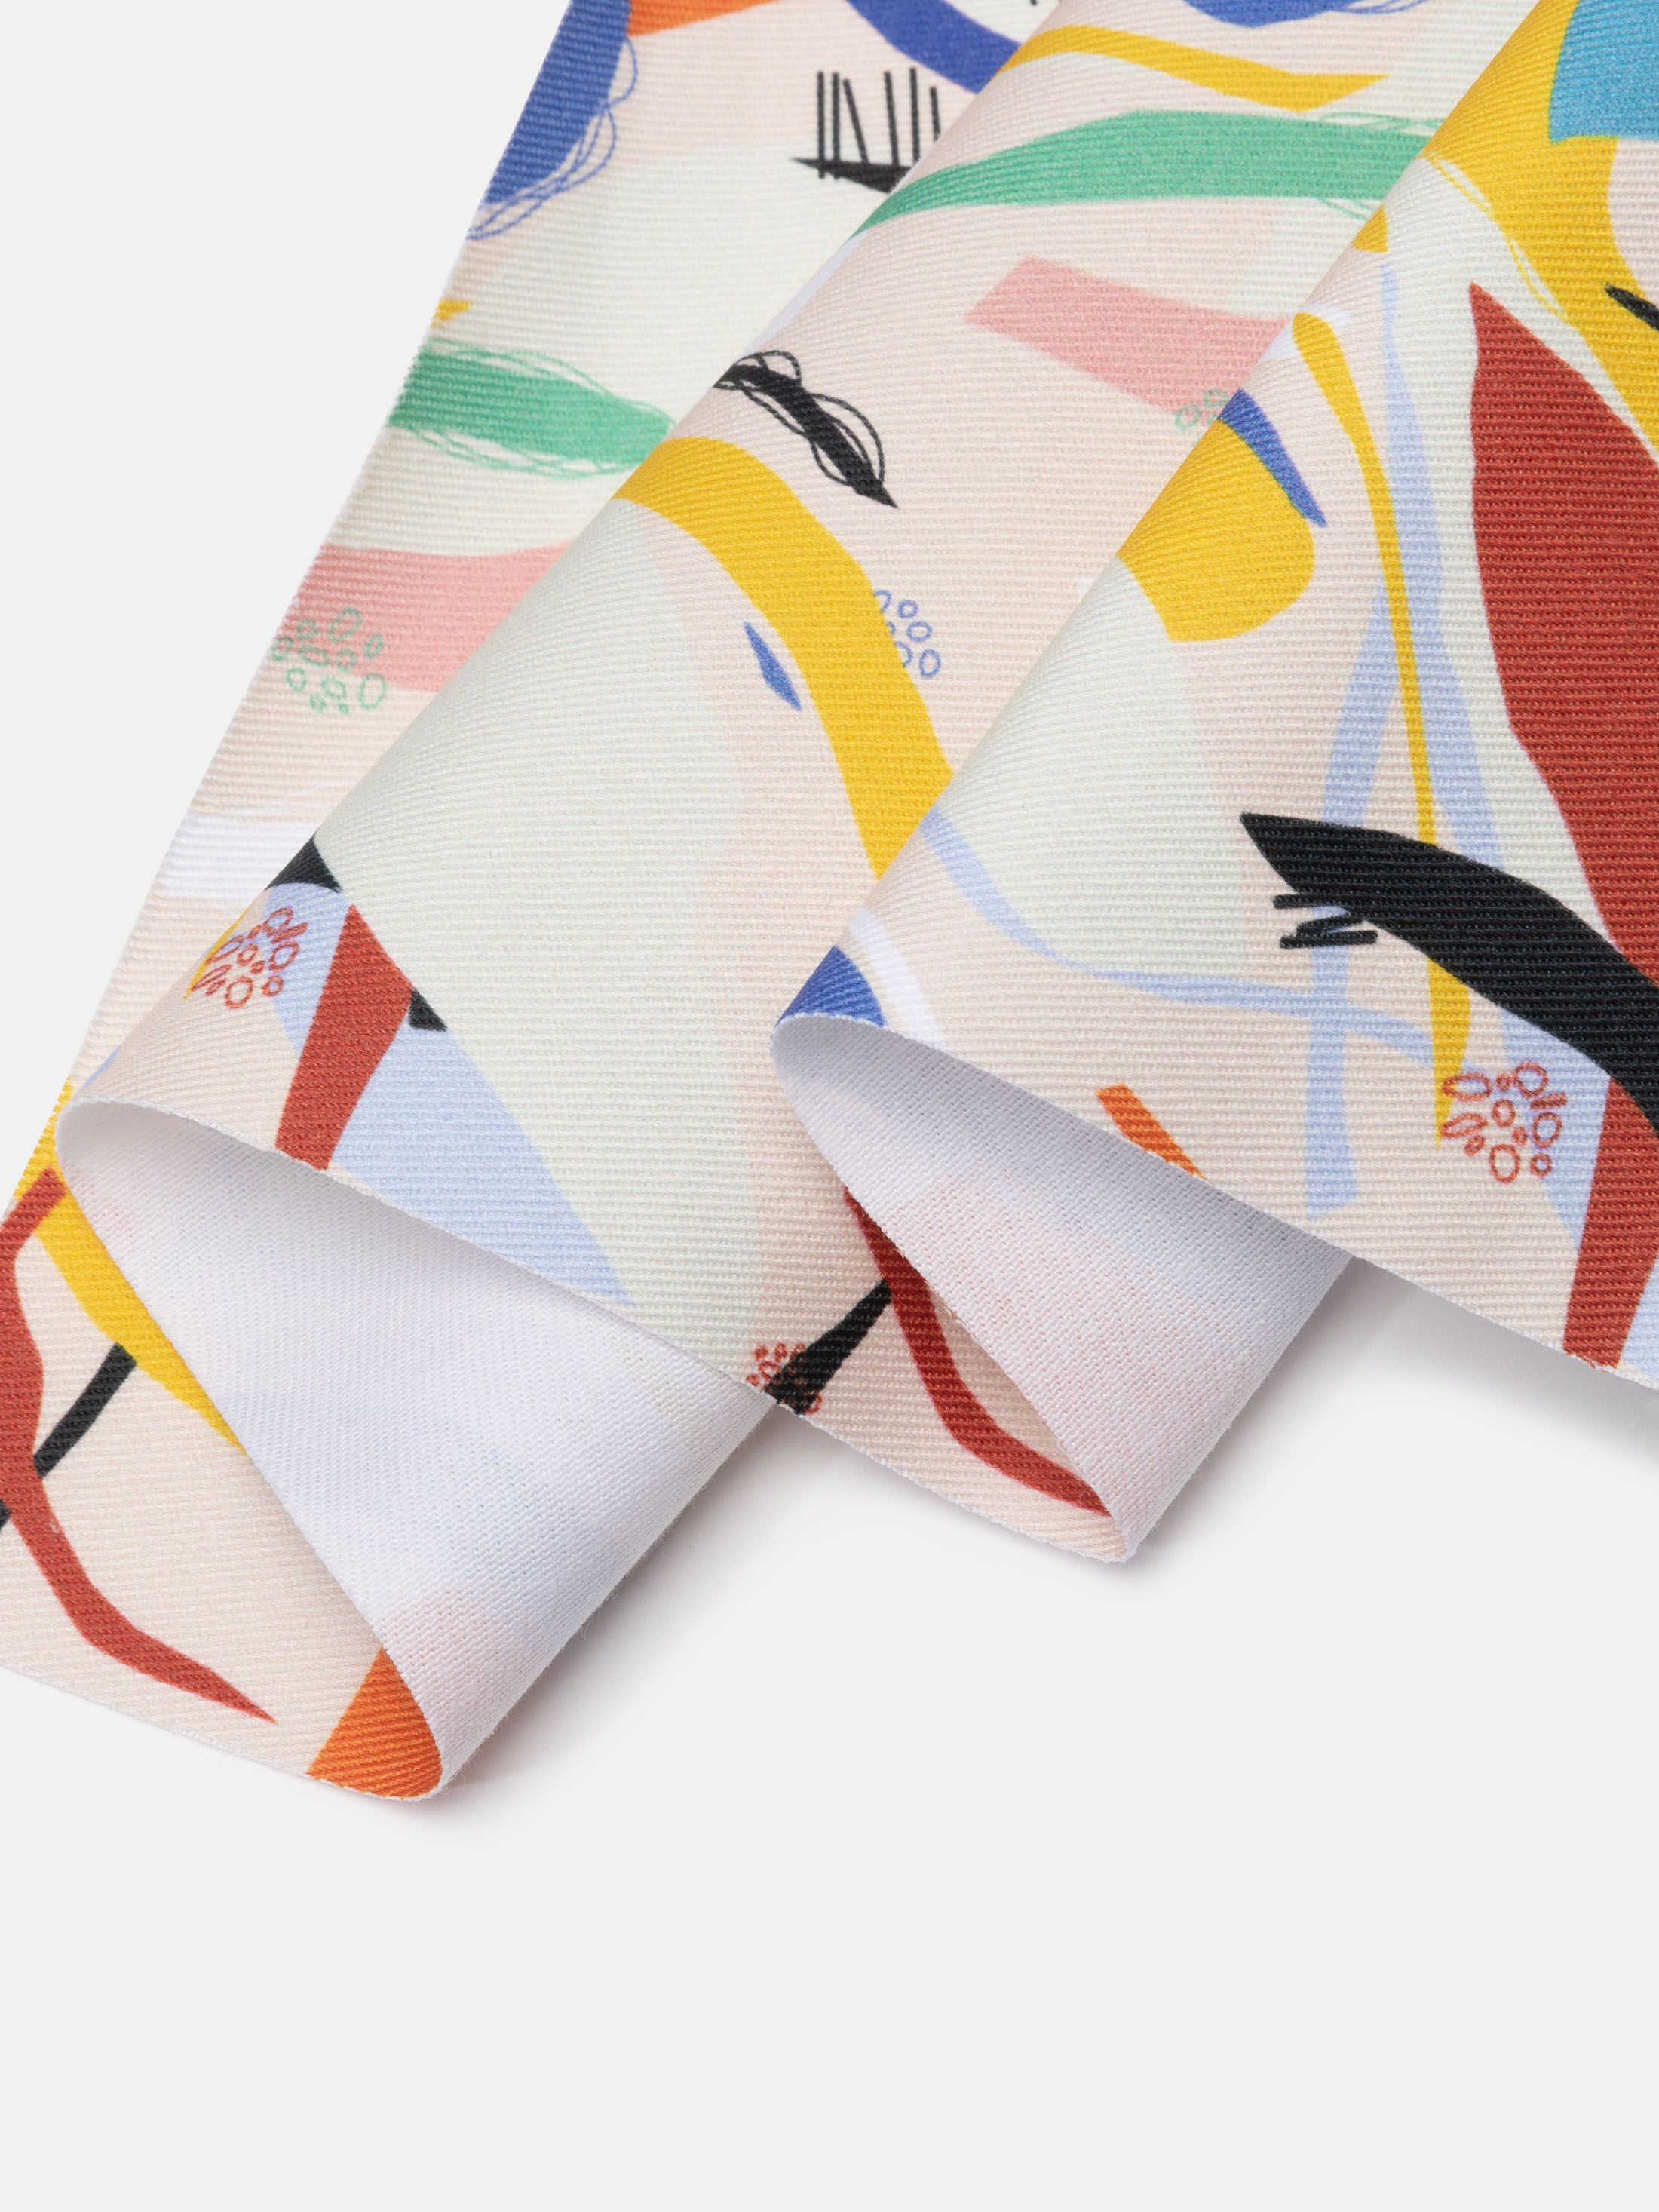 Cotton Drill Natural Fabric